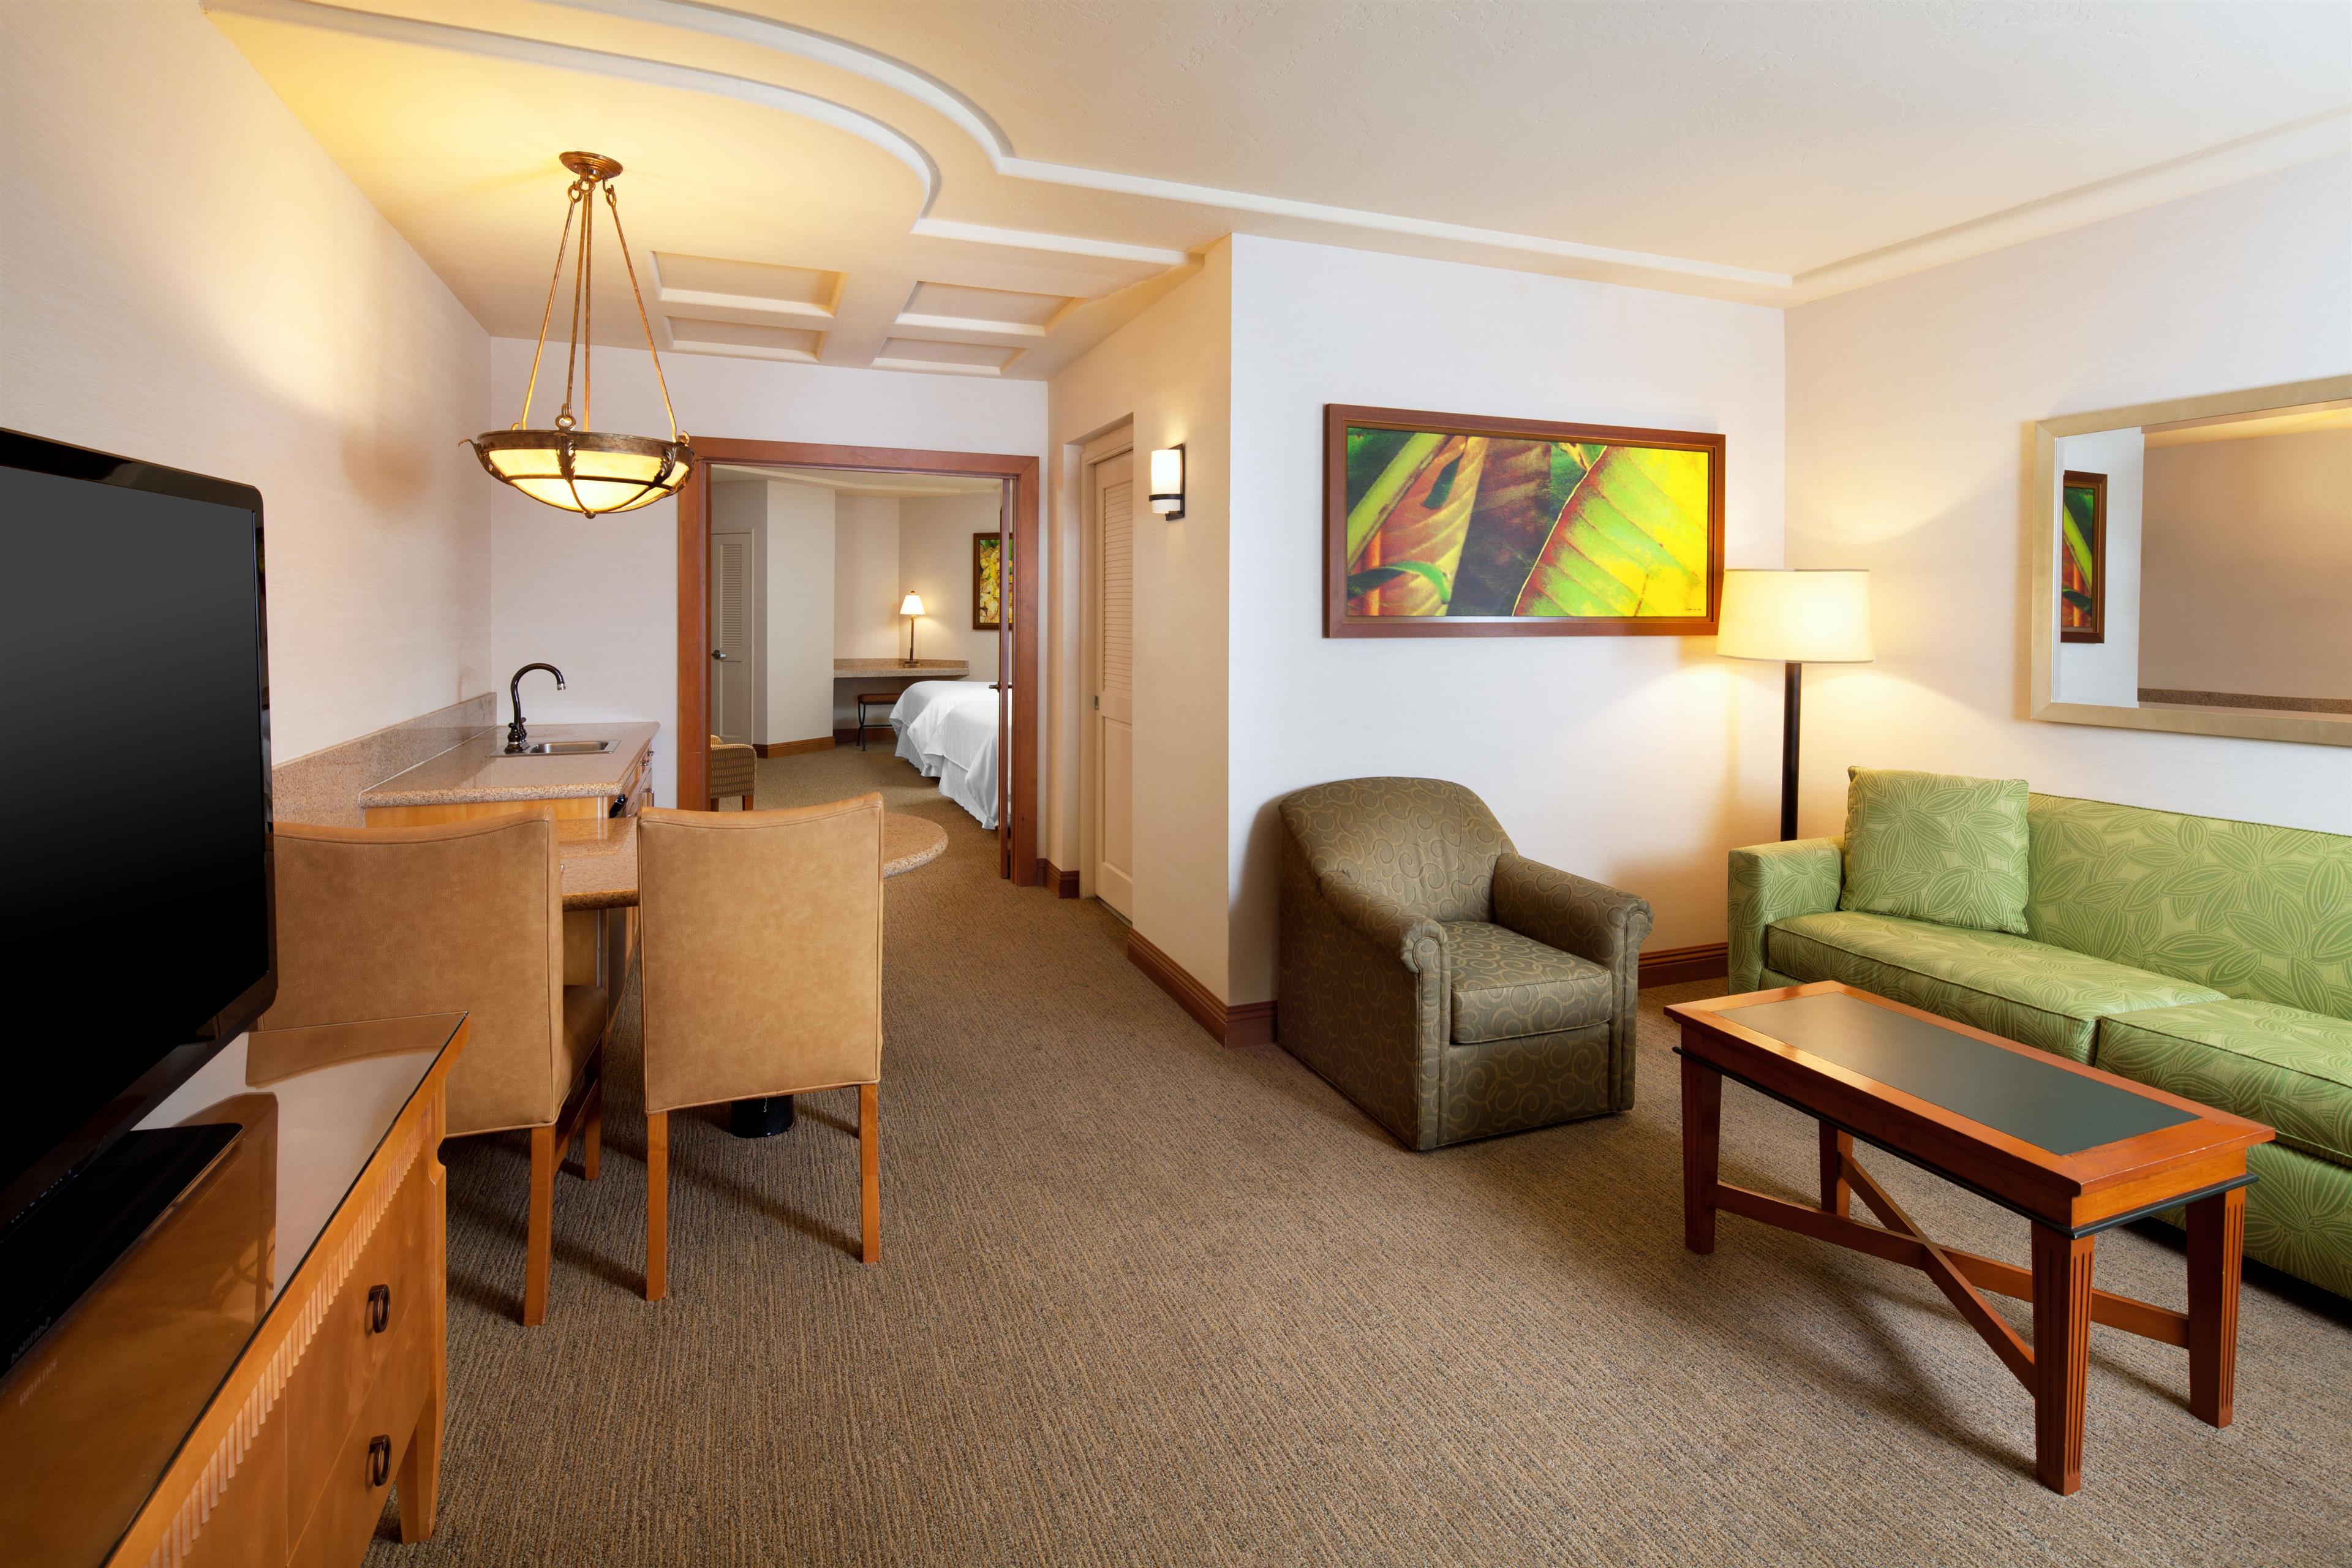 Sheraton La Jolla Hotel image 6